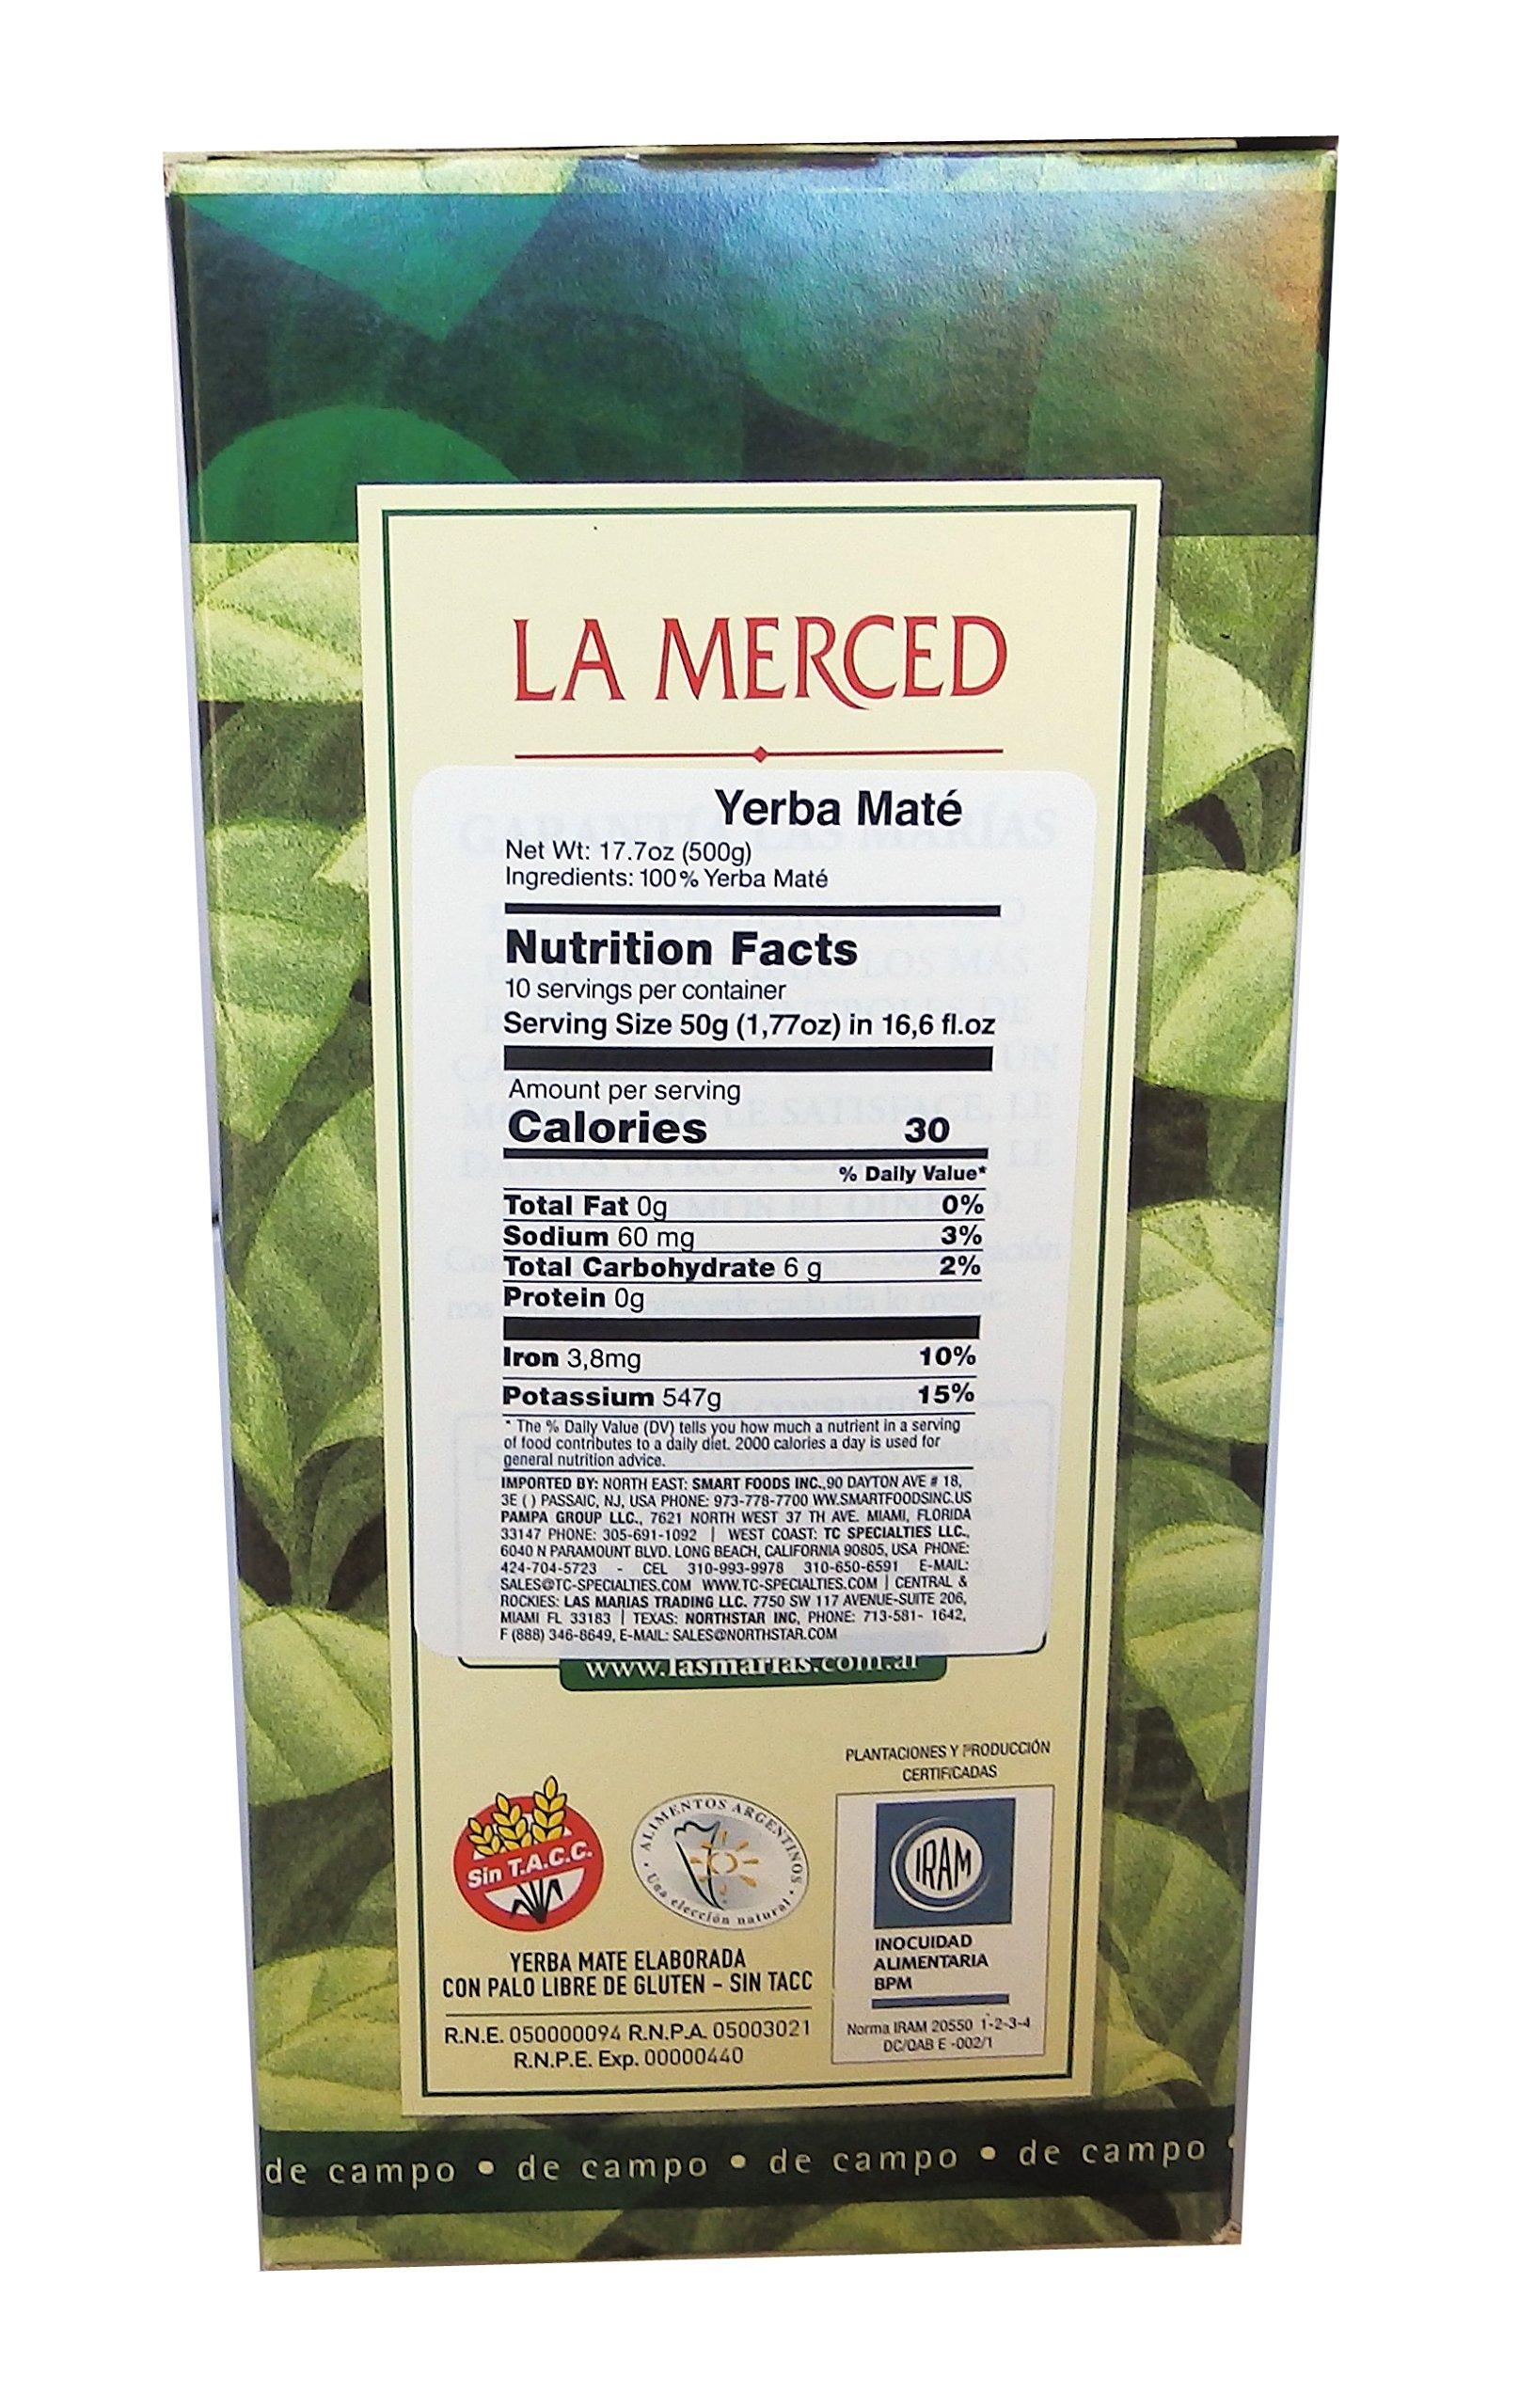 La Merced De Campo Yerba Mate 500 g (1.1 lbs) 6 Pack by La Merced (Image #4)